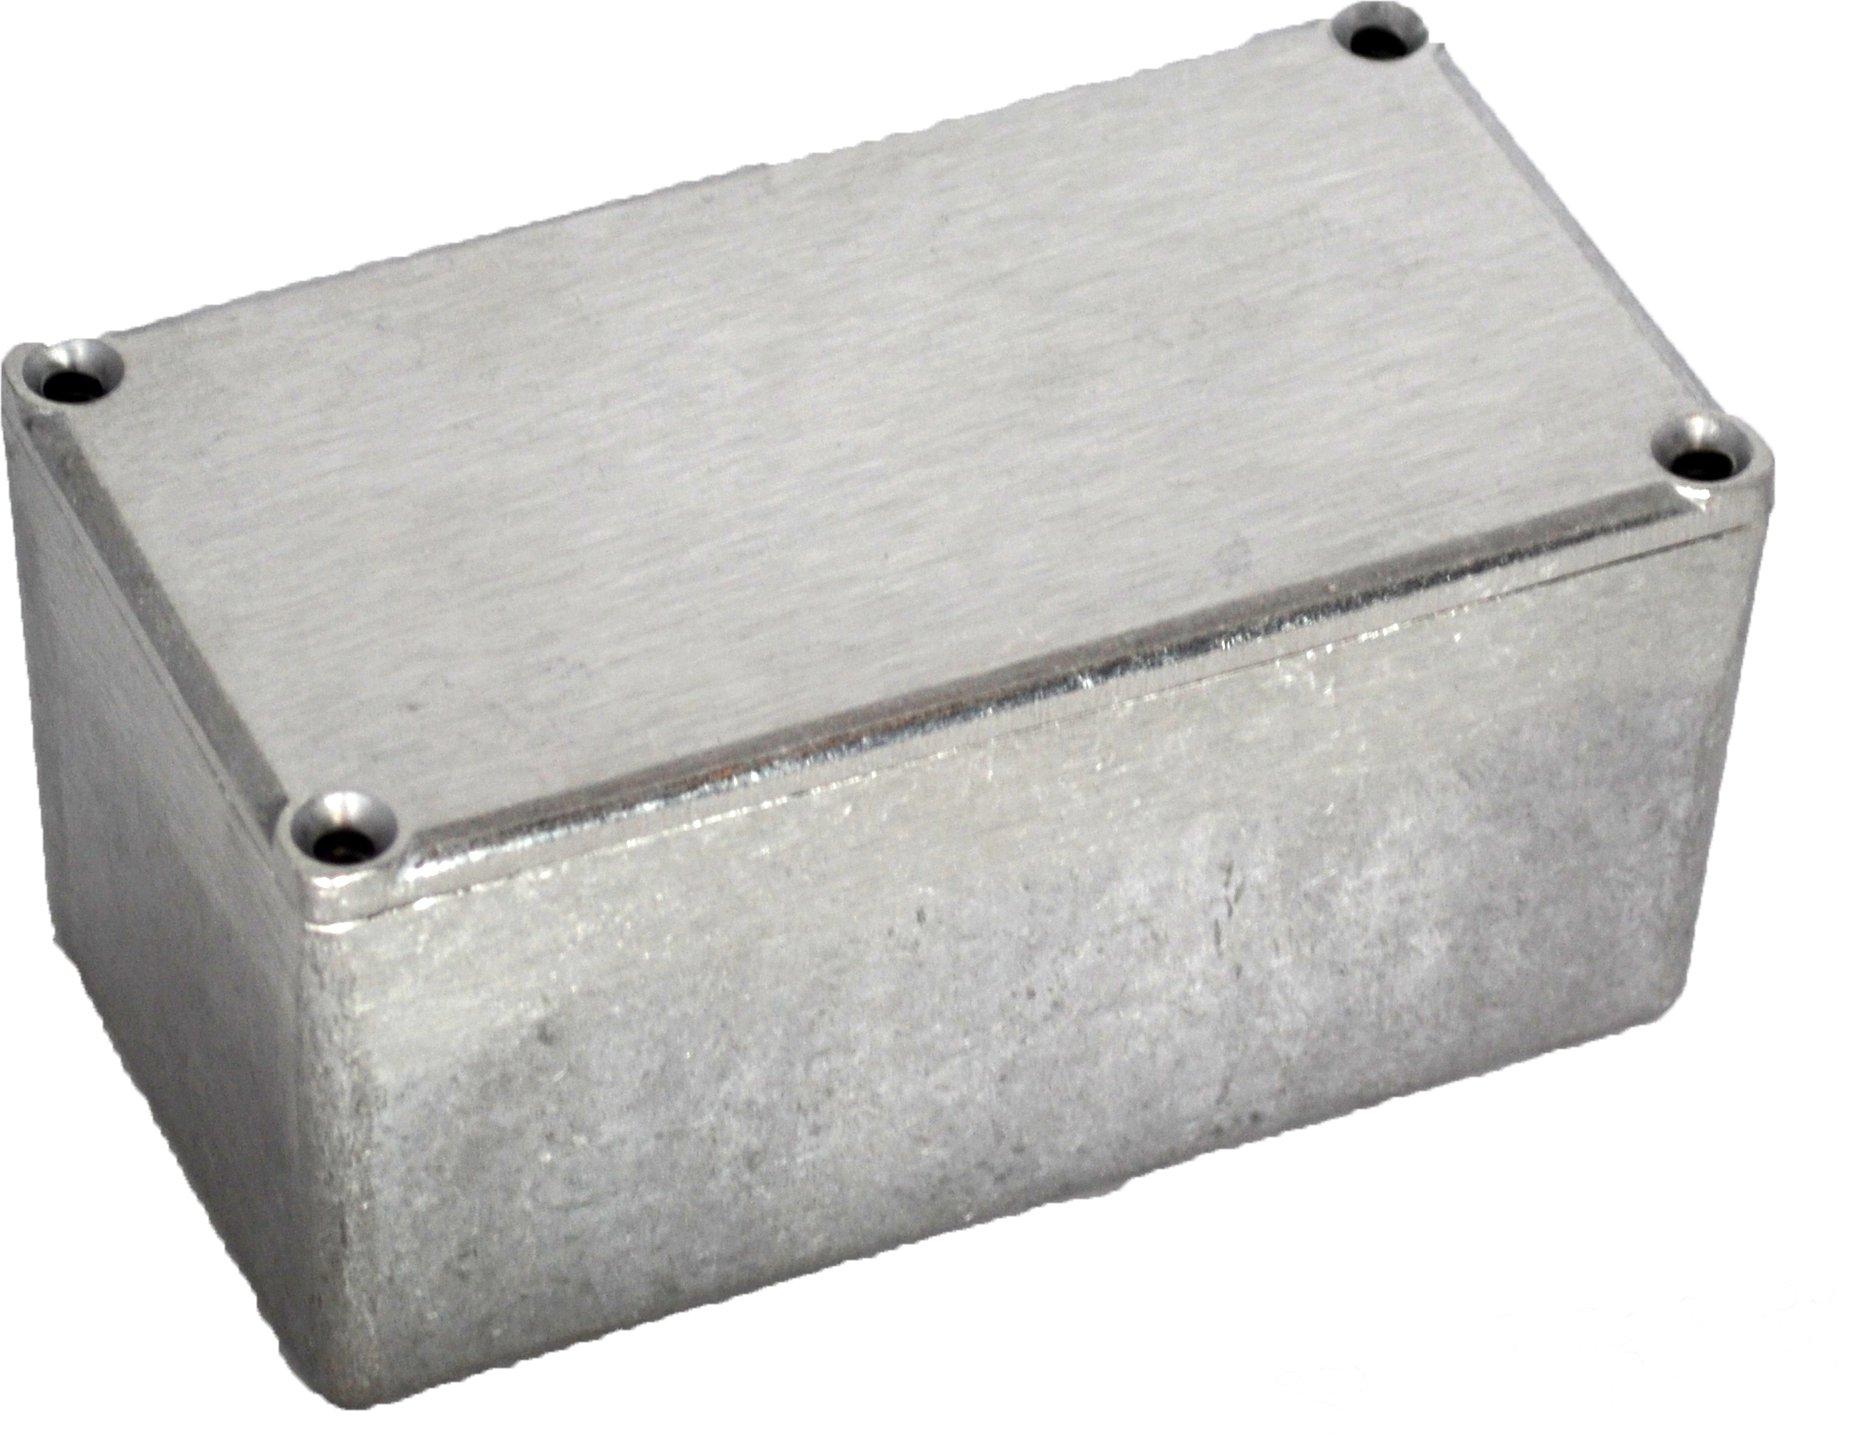 BUD Industries CU-479 Aluminum Econobox, 4-23/64'' Length x 2-23/64'' Width x 2-1/8'' Height, Natural Finish